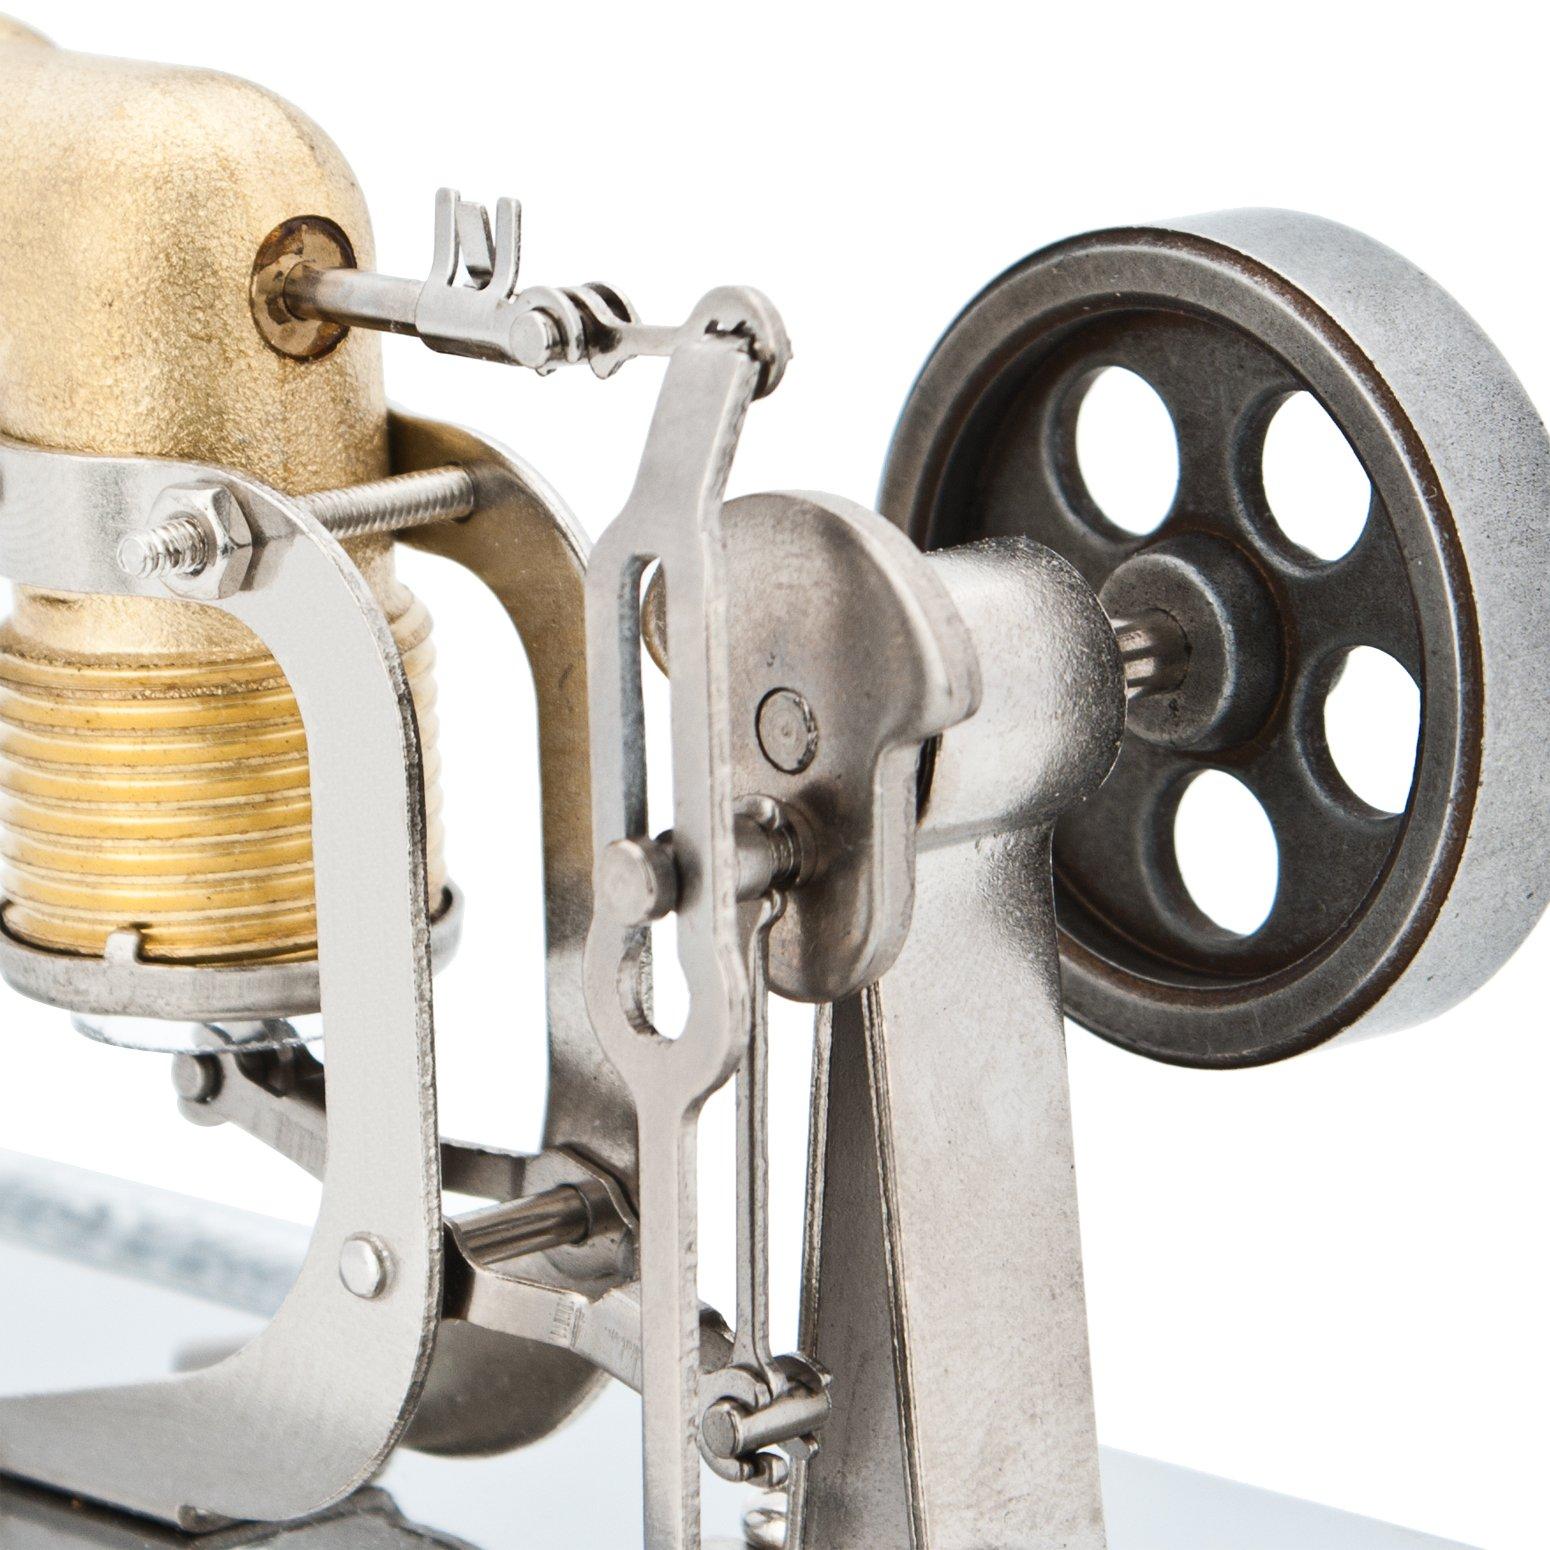 DjuiinoStar Mini Hot Air Stirling Engine: A High Performance Pocket-Sized Working Model by DjuiinoStar (Image #8)